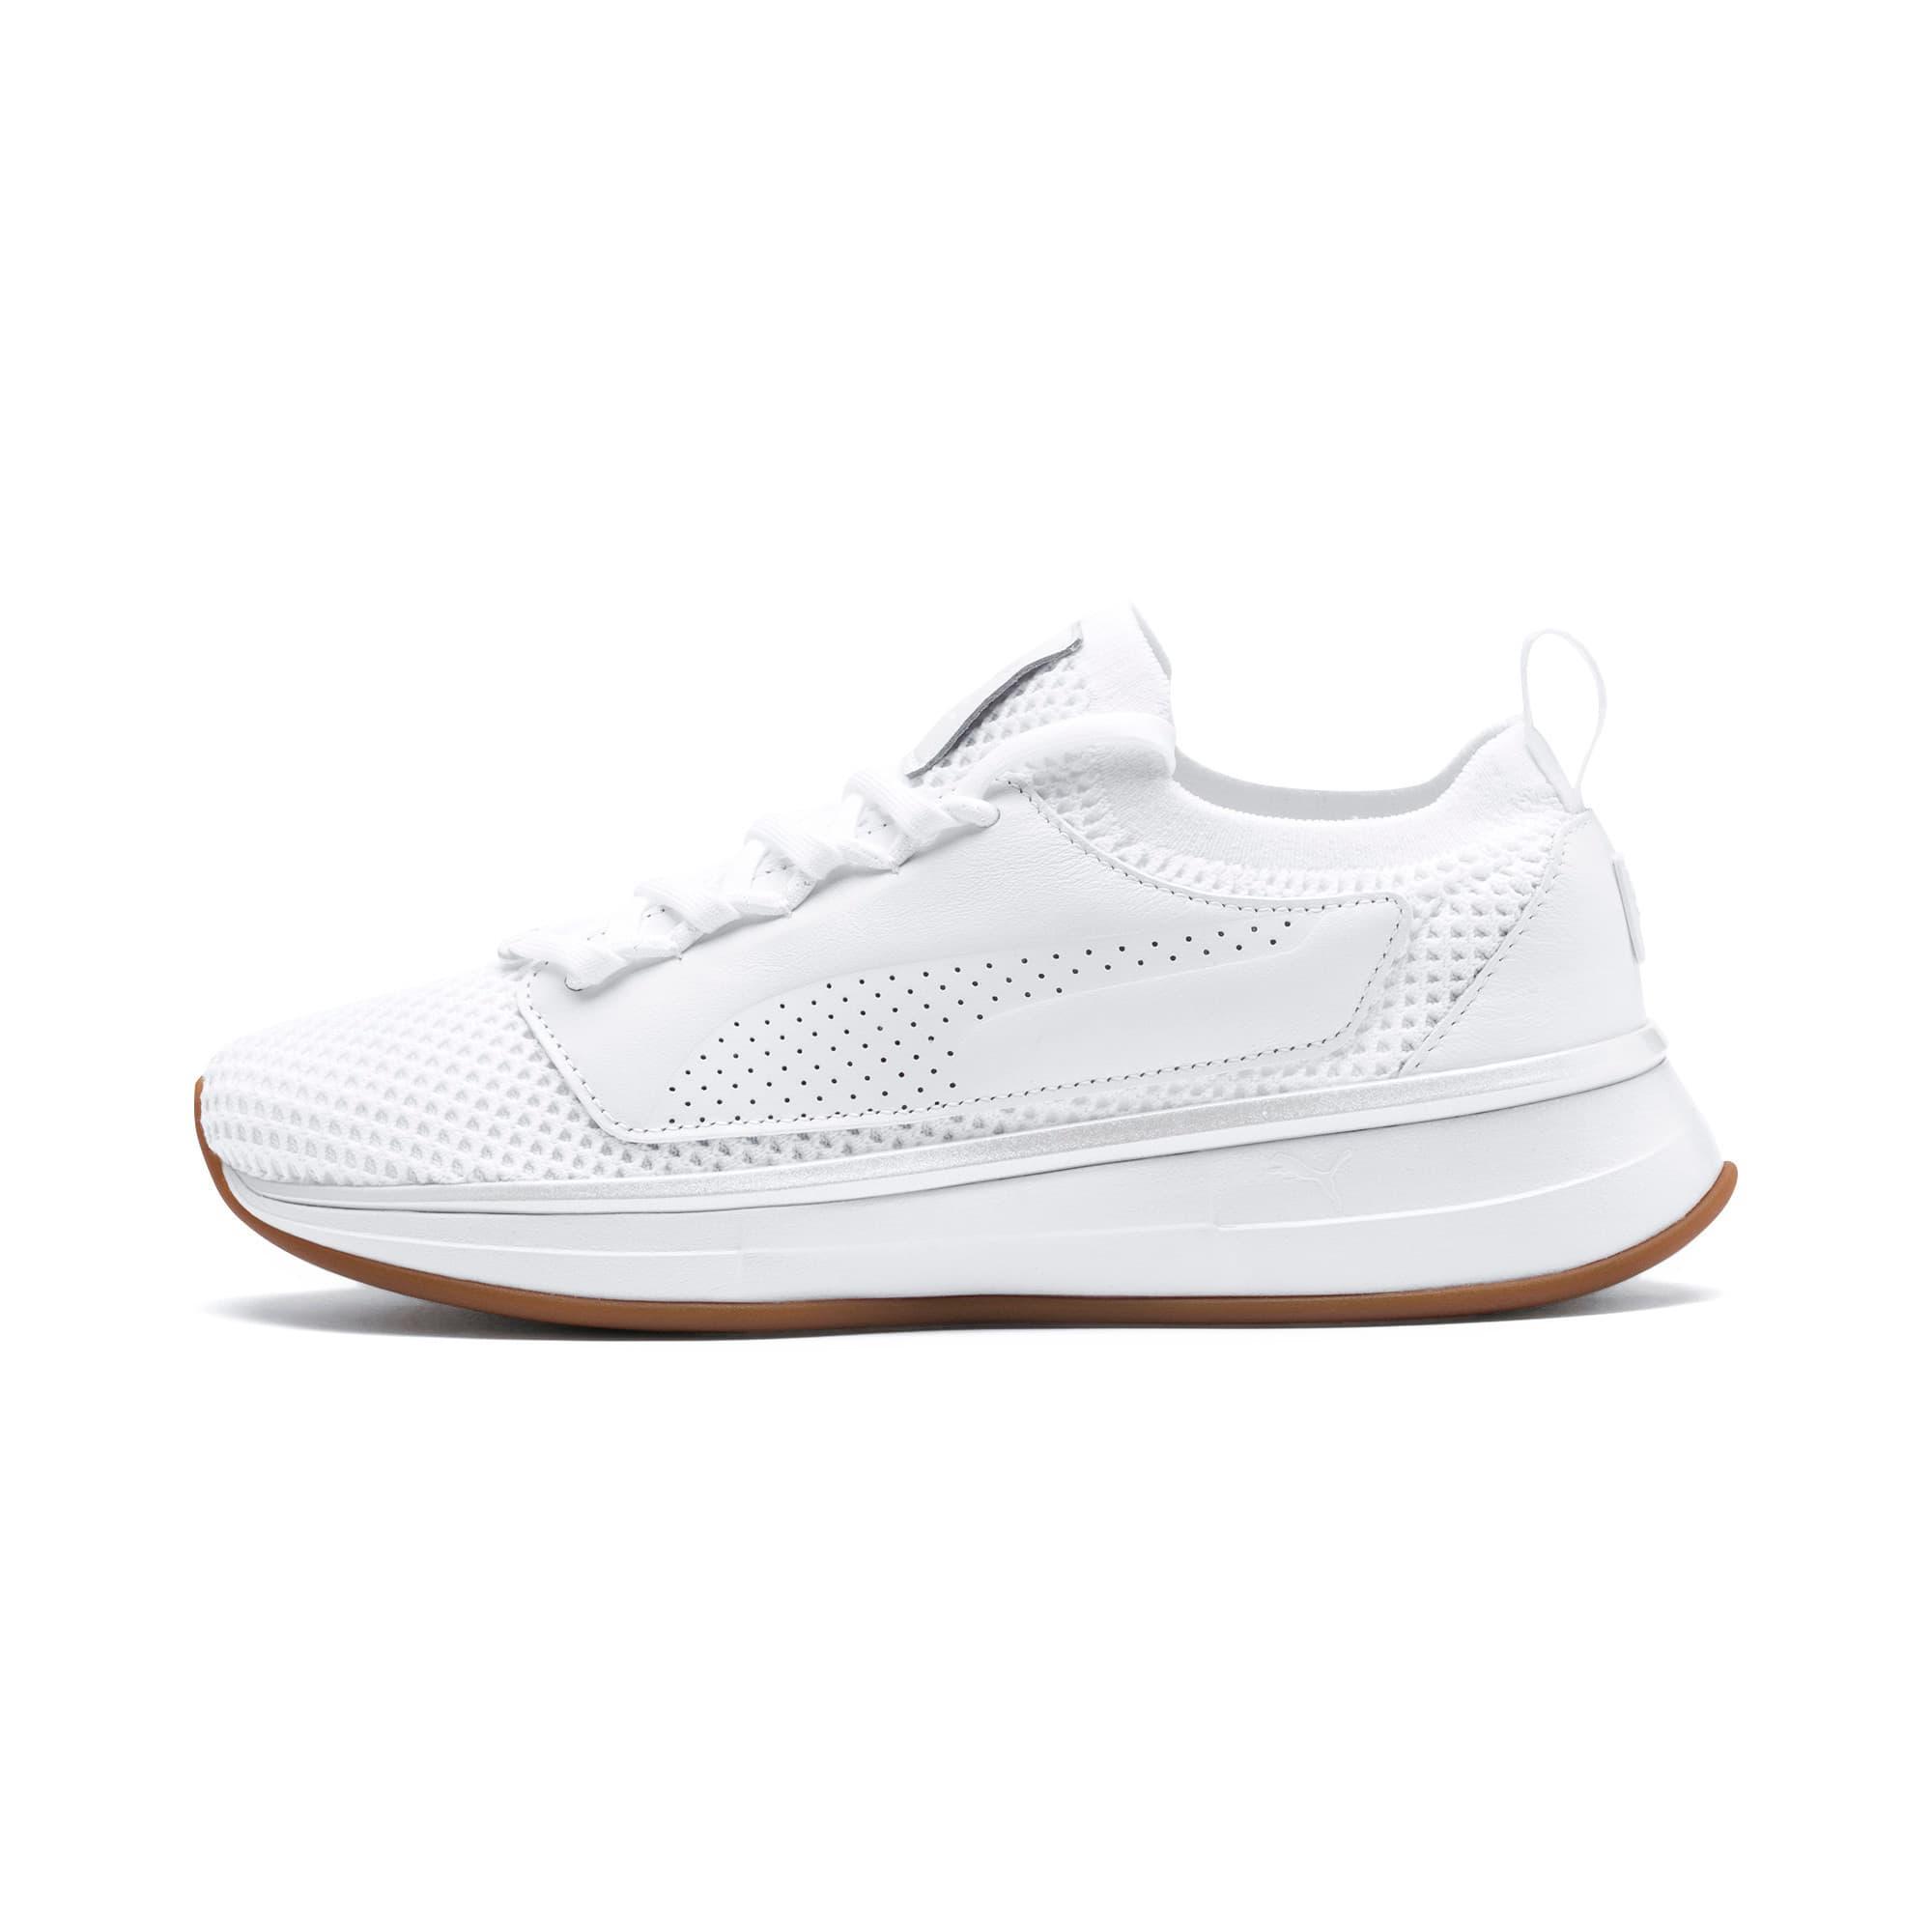 Thumbnail 1 of PUMA x SELENA GOMEZ Runner Women's Training Shoes, Puma White, medium-IND